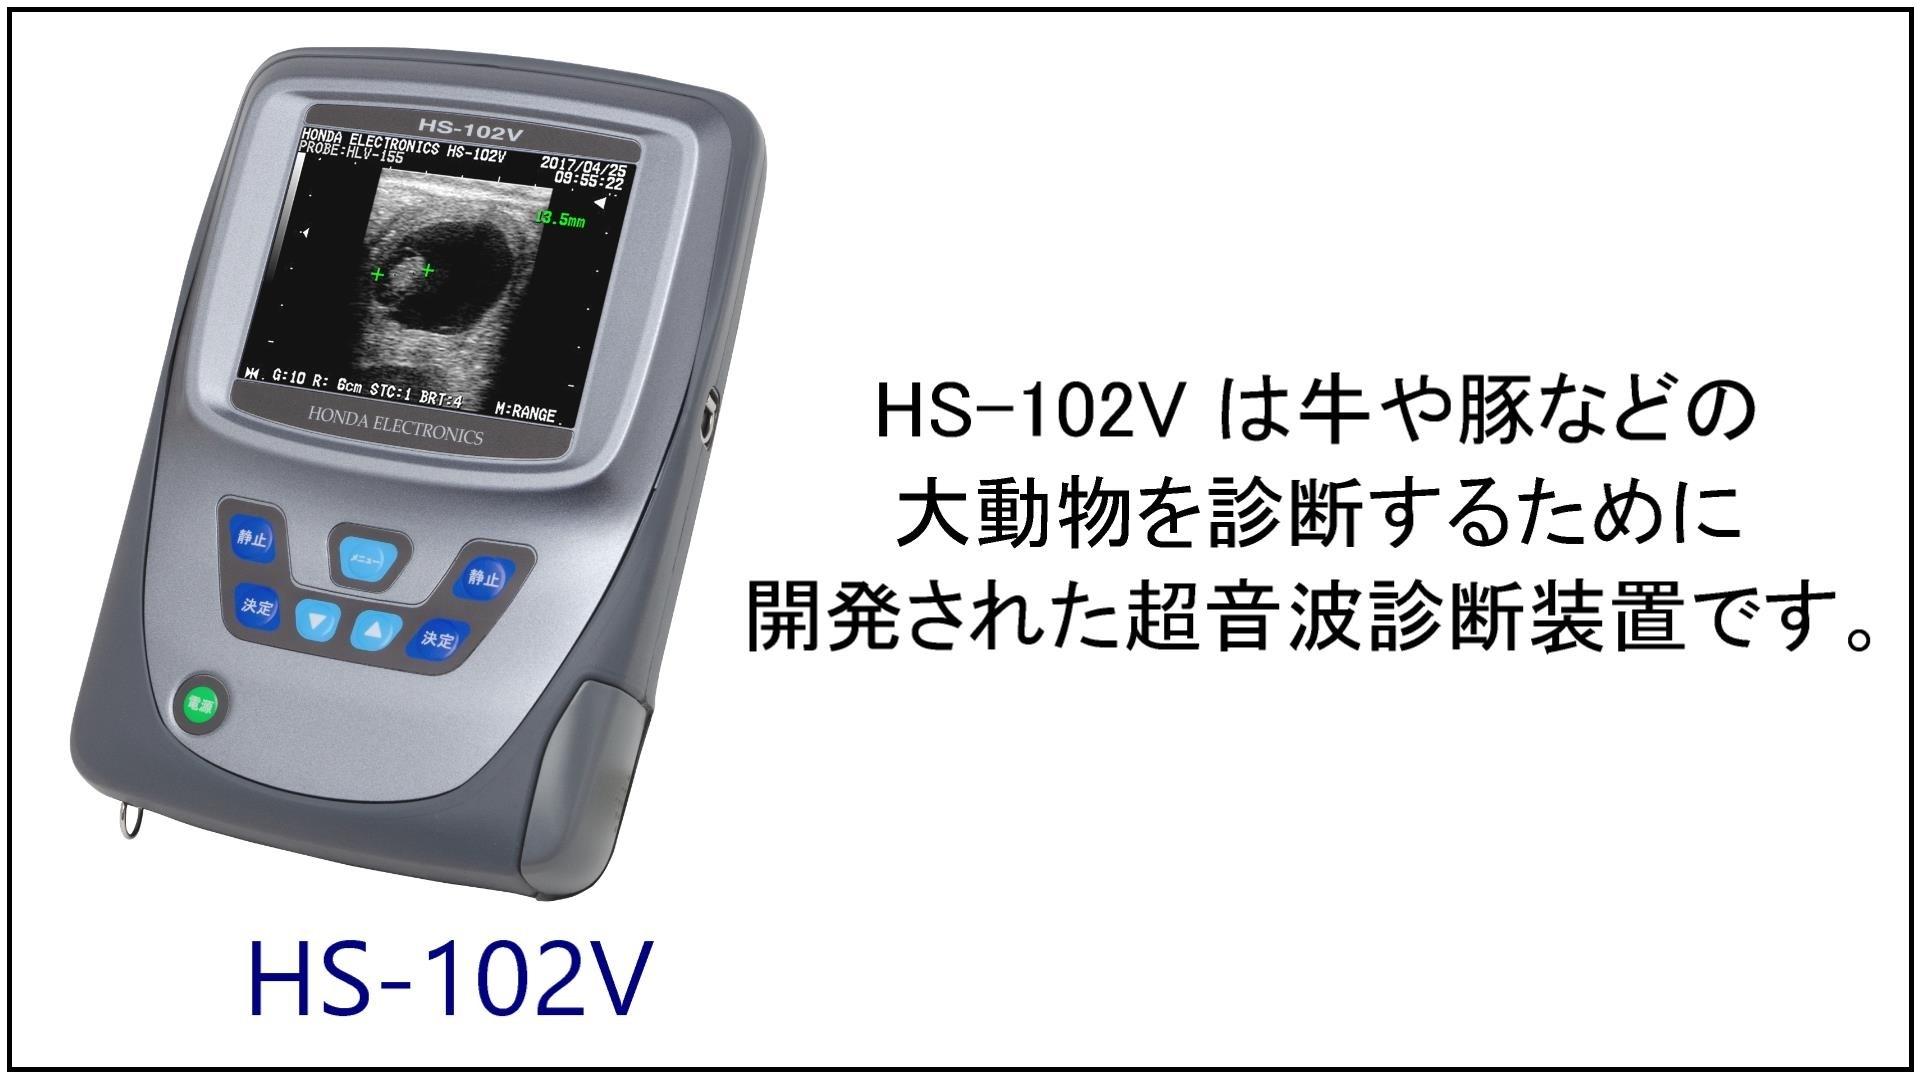 HS-102V 日本語 0528-2